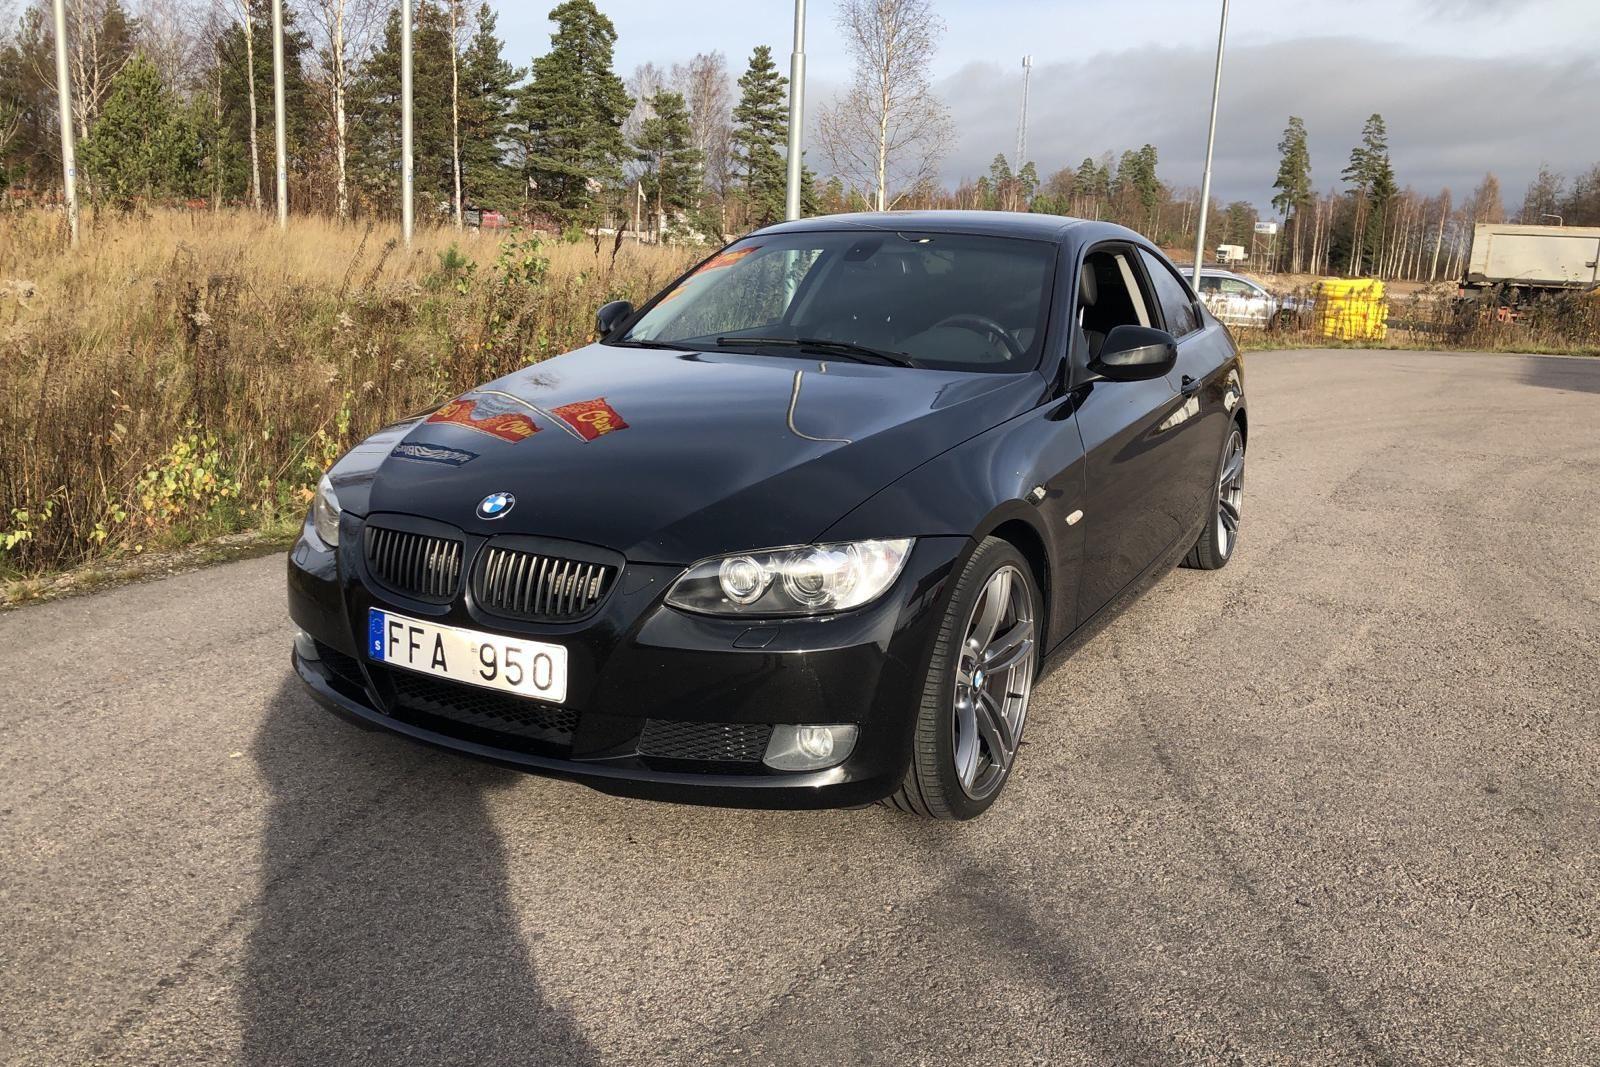 BMW 320i Coupé, E92 (170 Stunden)